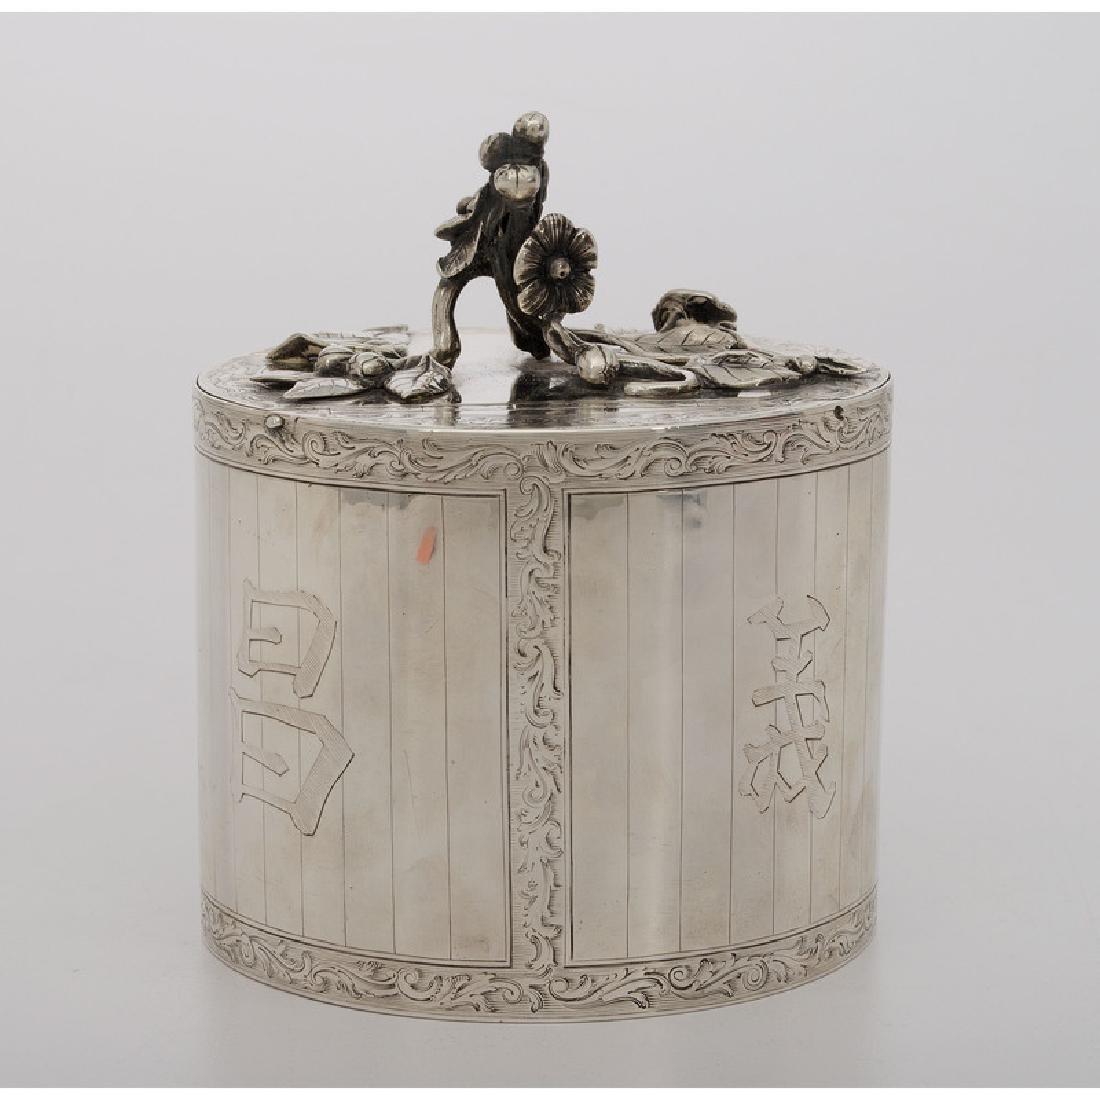 Chinoiserie Silver Tea Caddy, Parker & Wakelin - 2